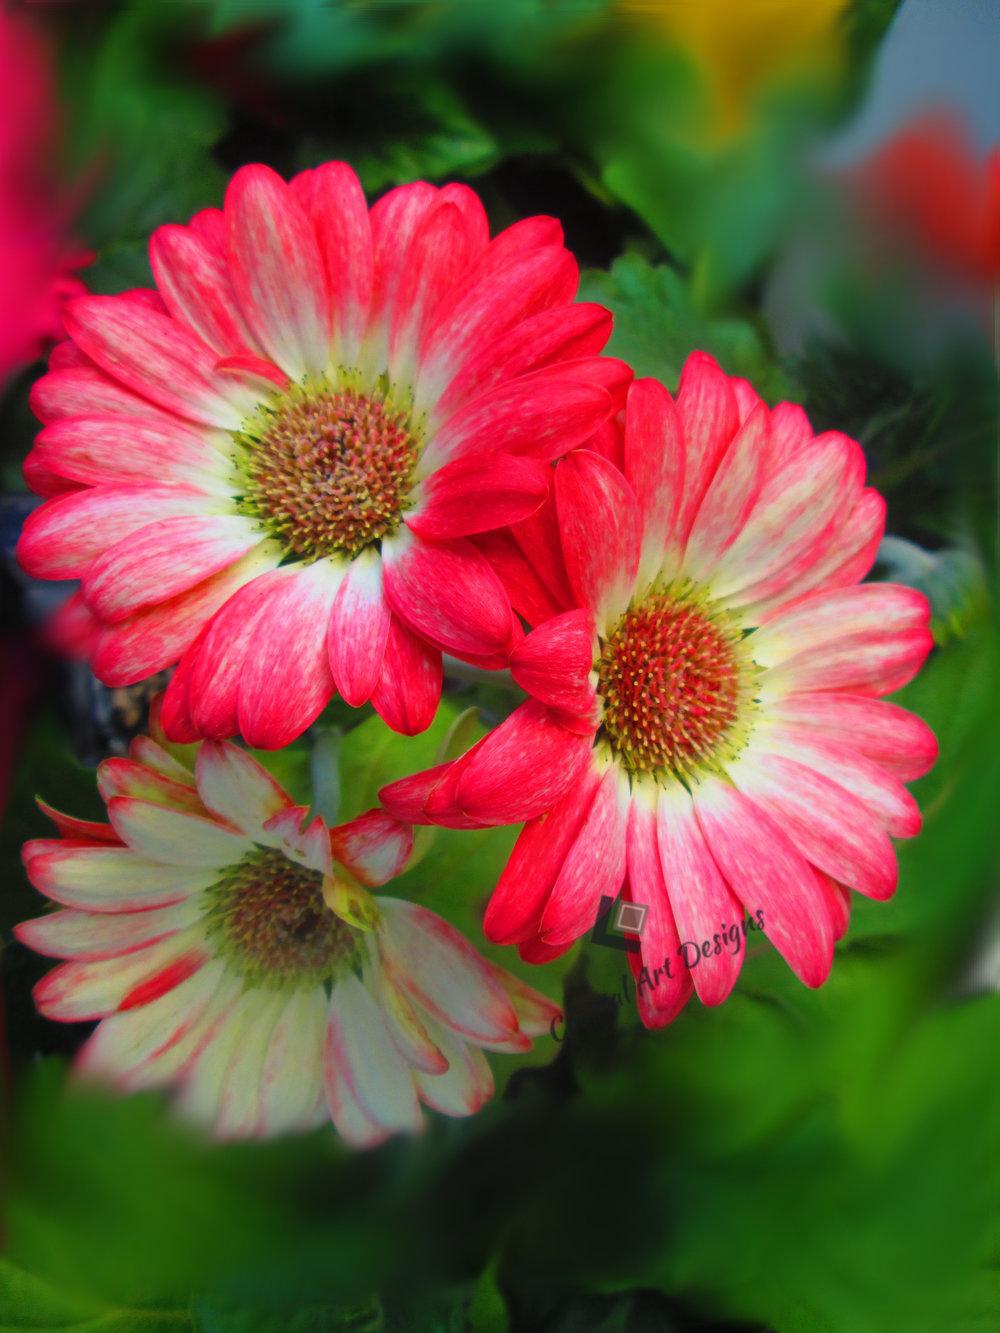 blurred-red-flower-print.jpg